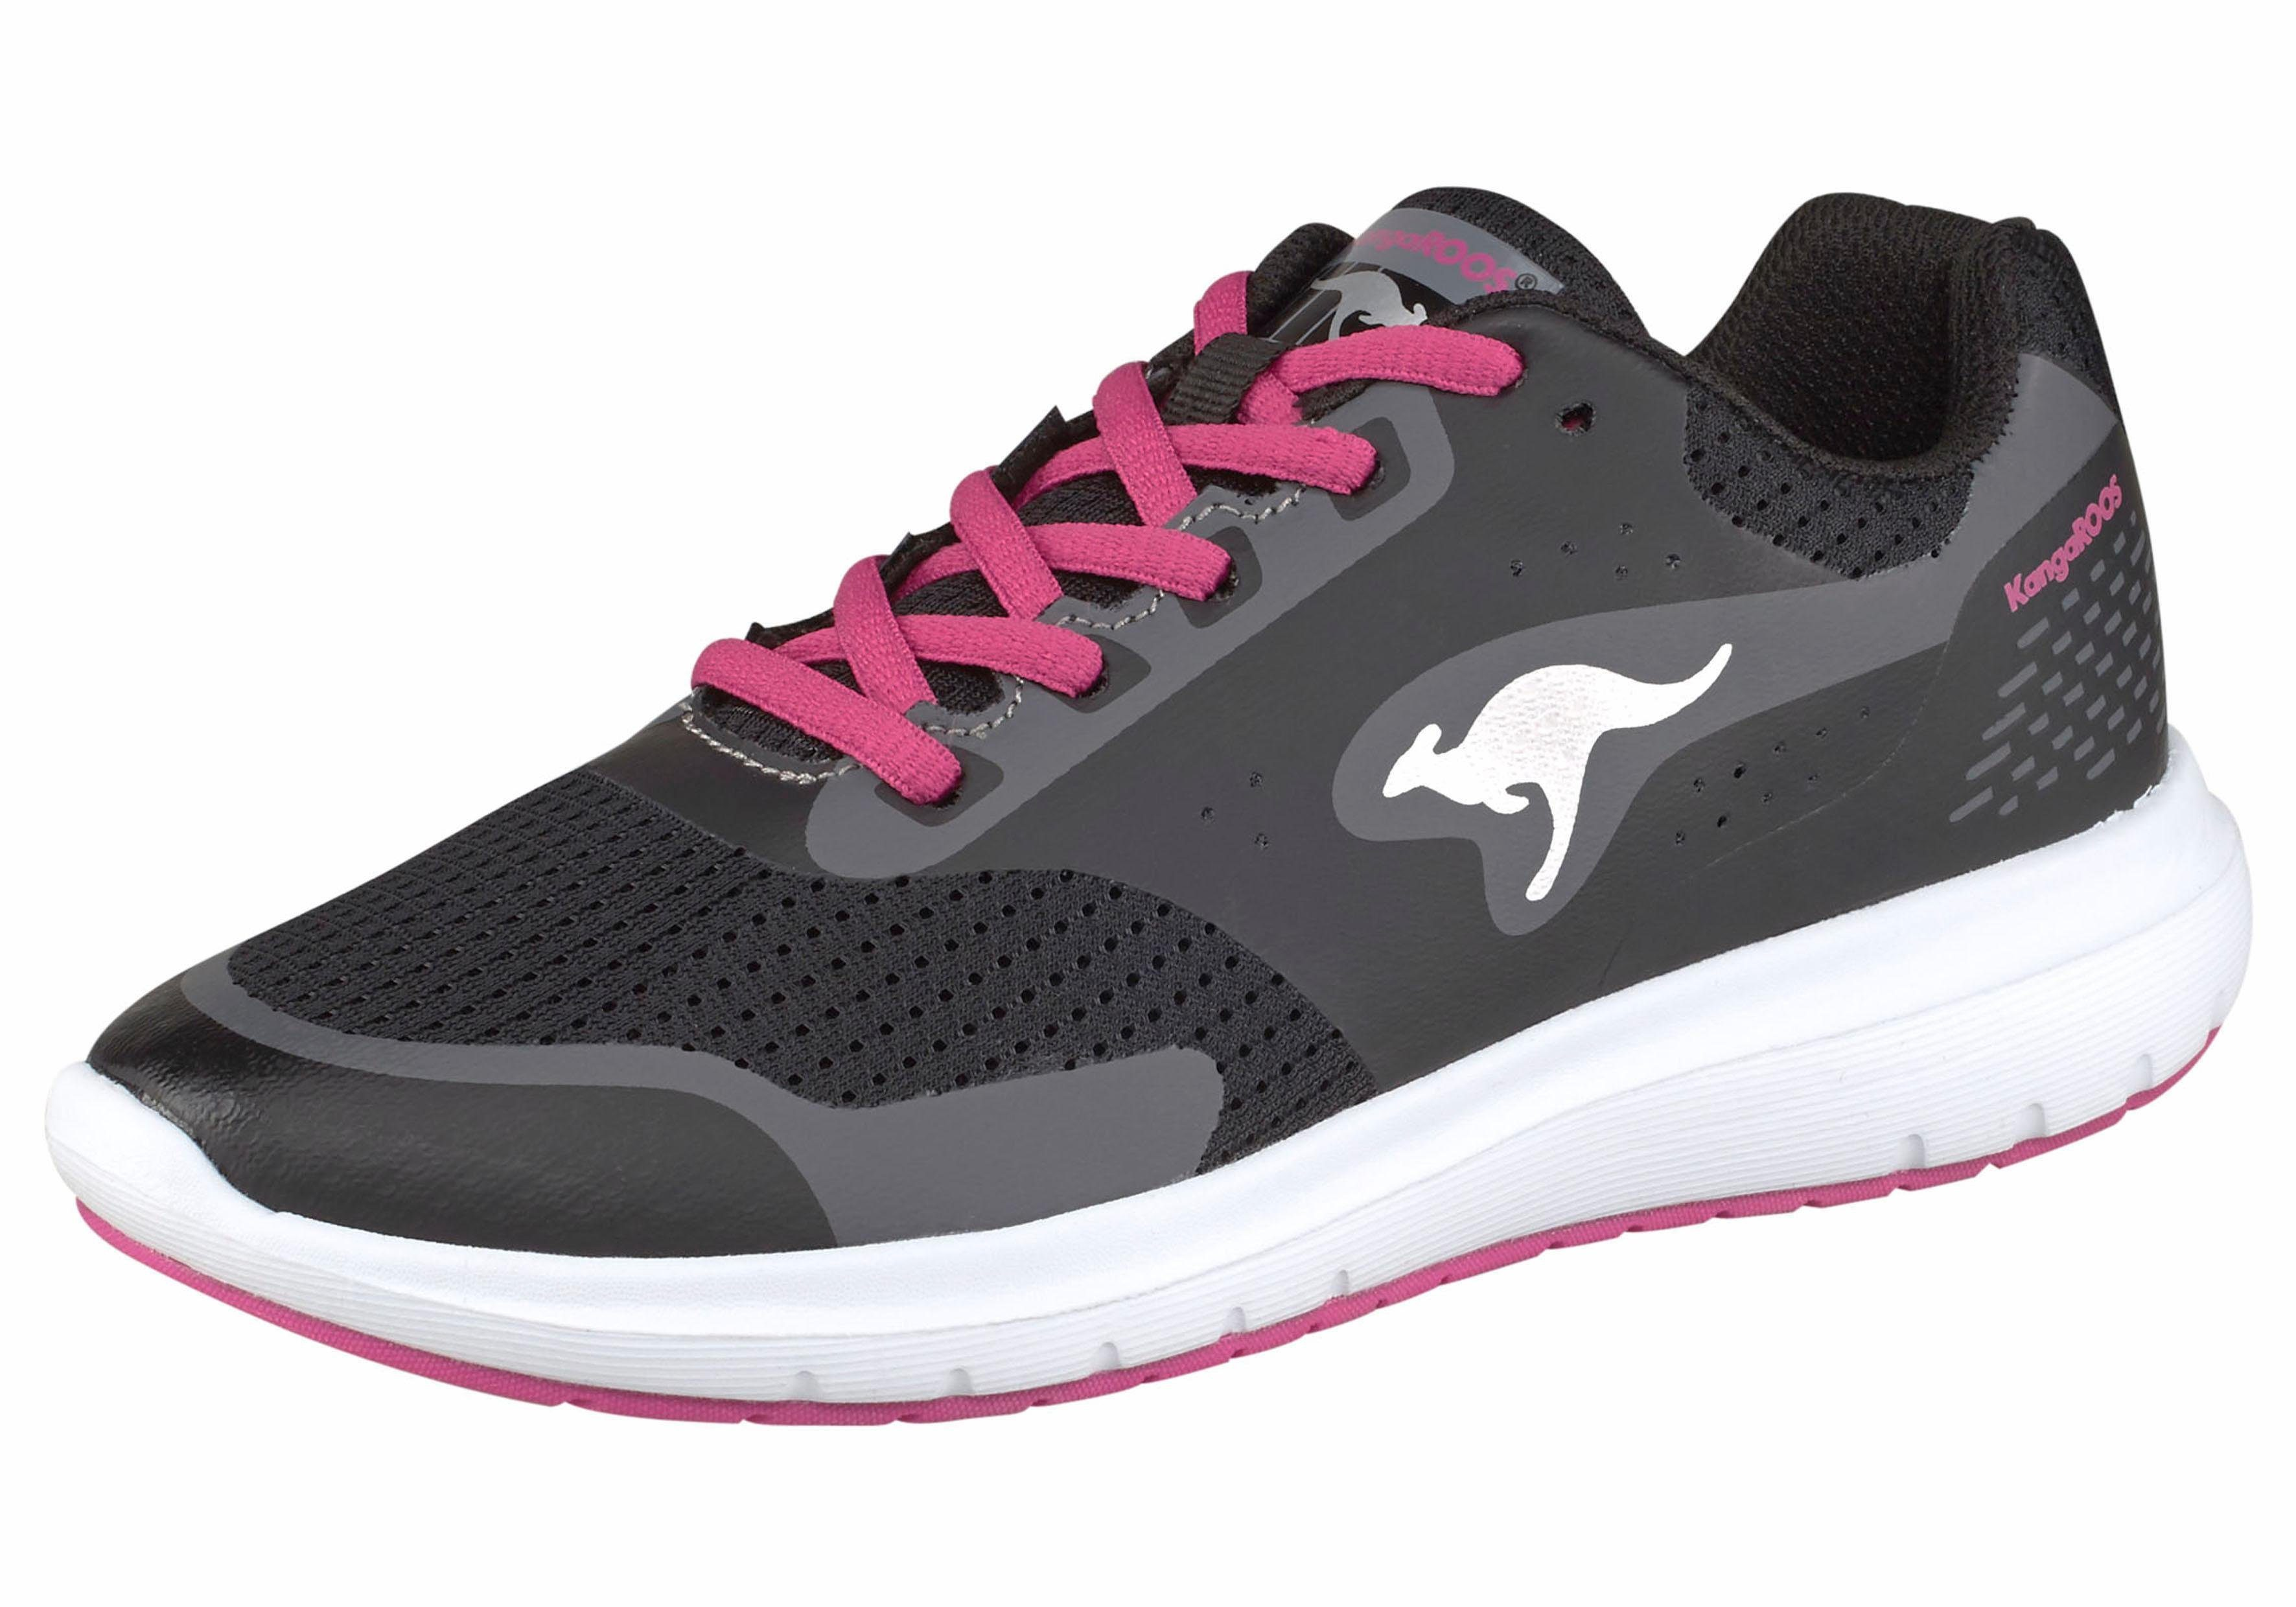 Chaussures De Sport Kangourous Faible Noir ijvbi6